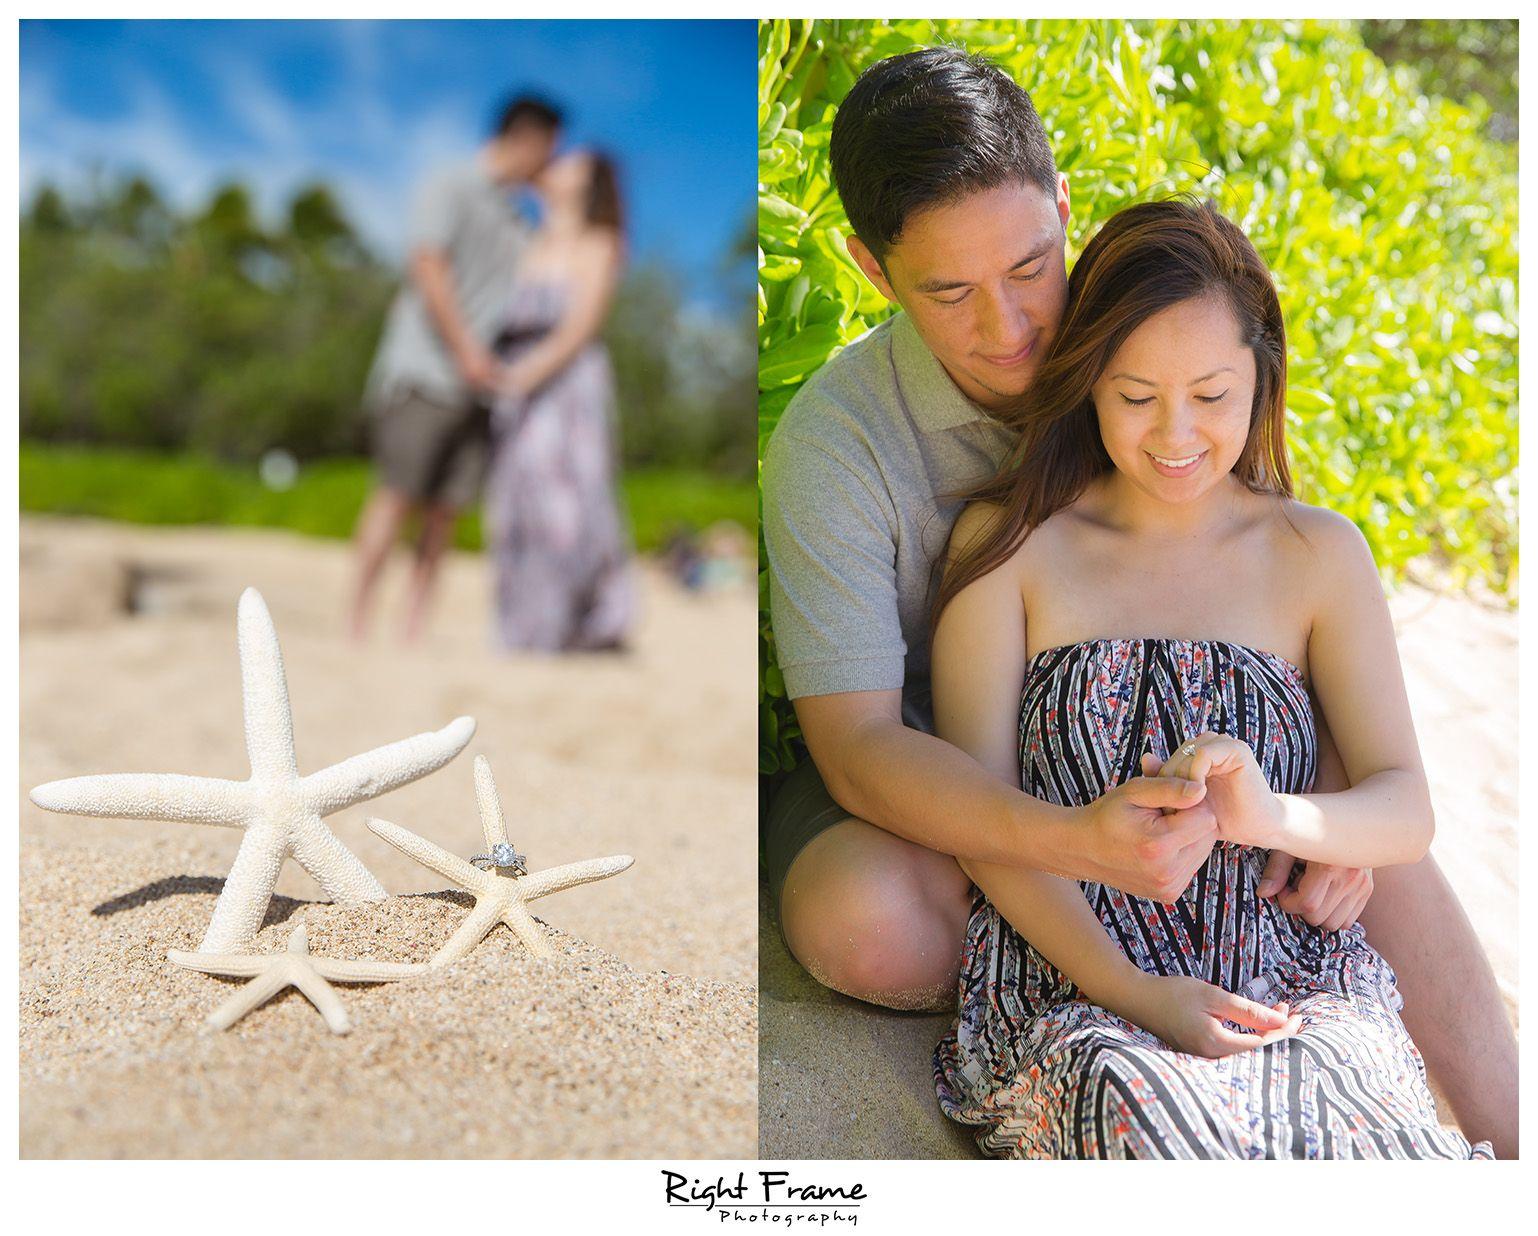 www.RightFrame.net - Surprise Engagement Proposal at Ko Olina Beach, (Secret Beach) near Four Seasons Hotel Ko'Olina, Oahu, Hawaii. Photography Ideas.